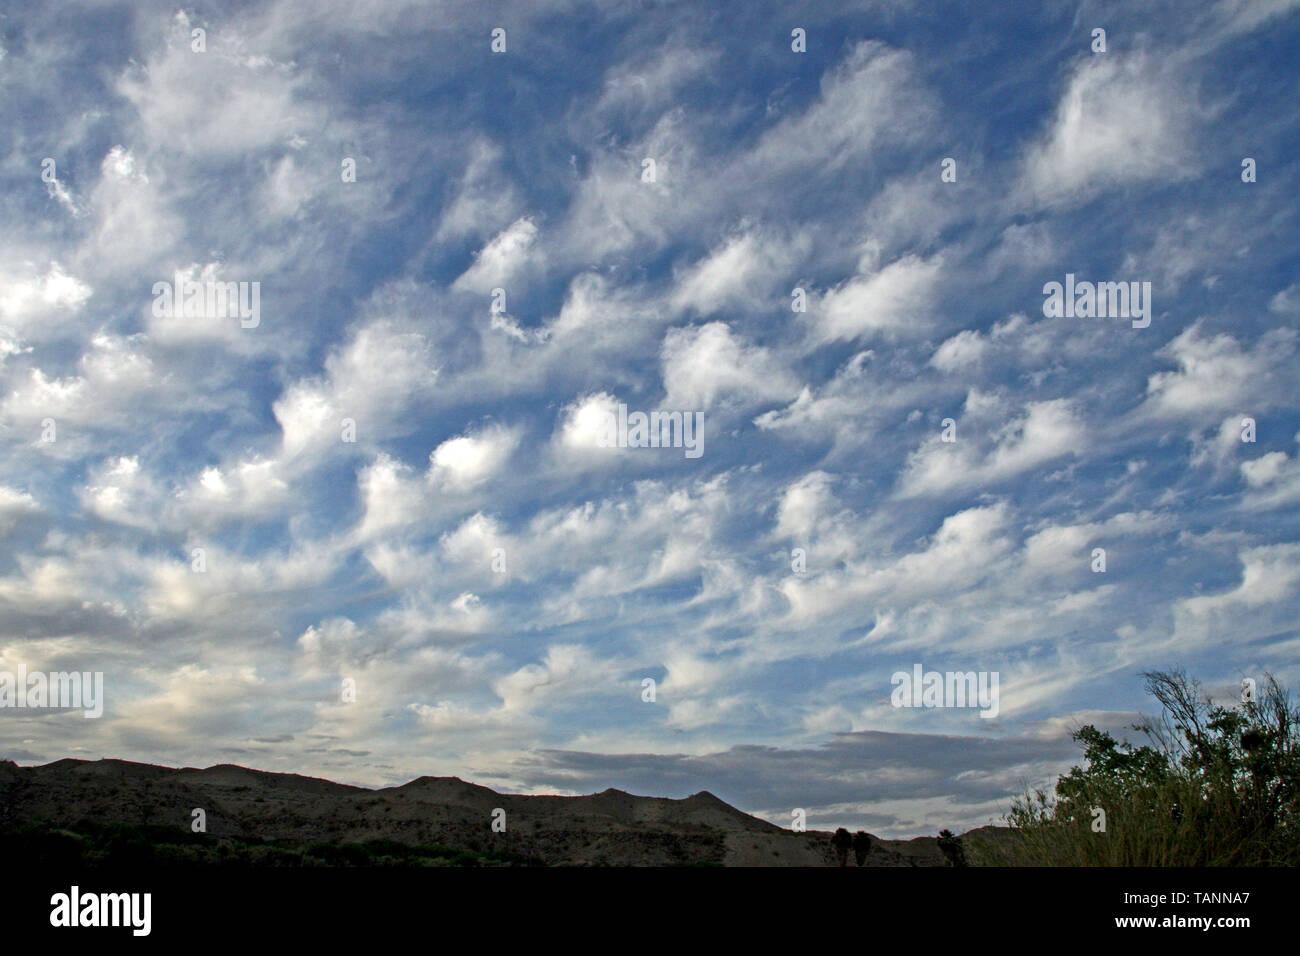 Whispy Cloud Sky - Stock Image